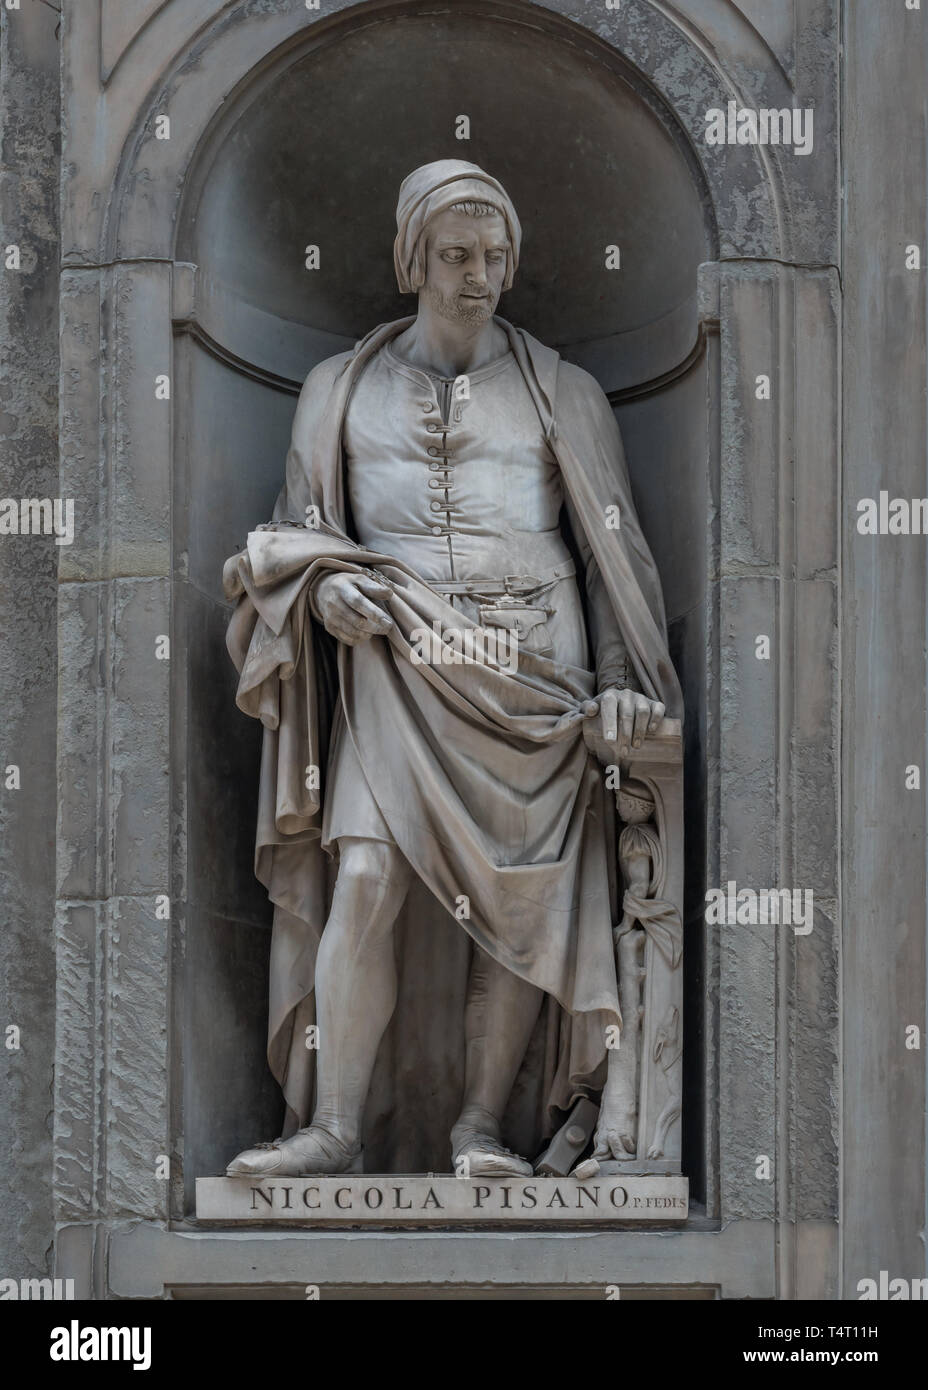 Statue of Nicola Pisano in Florence, Capital of Tuscany, Italy Stock Photo